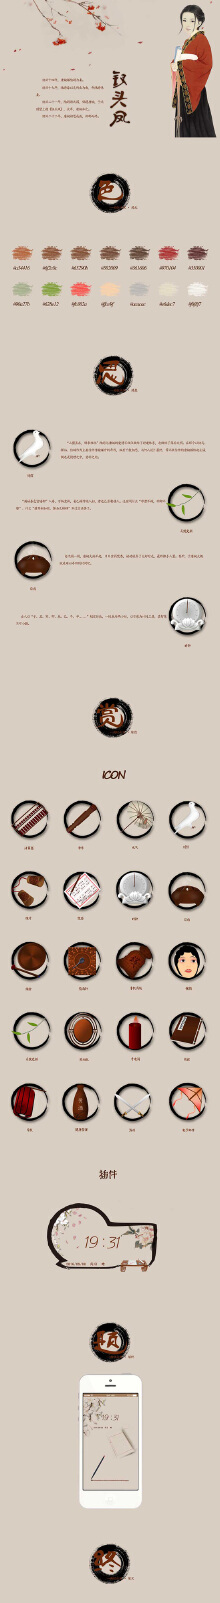 UI设计 -GUI展示